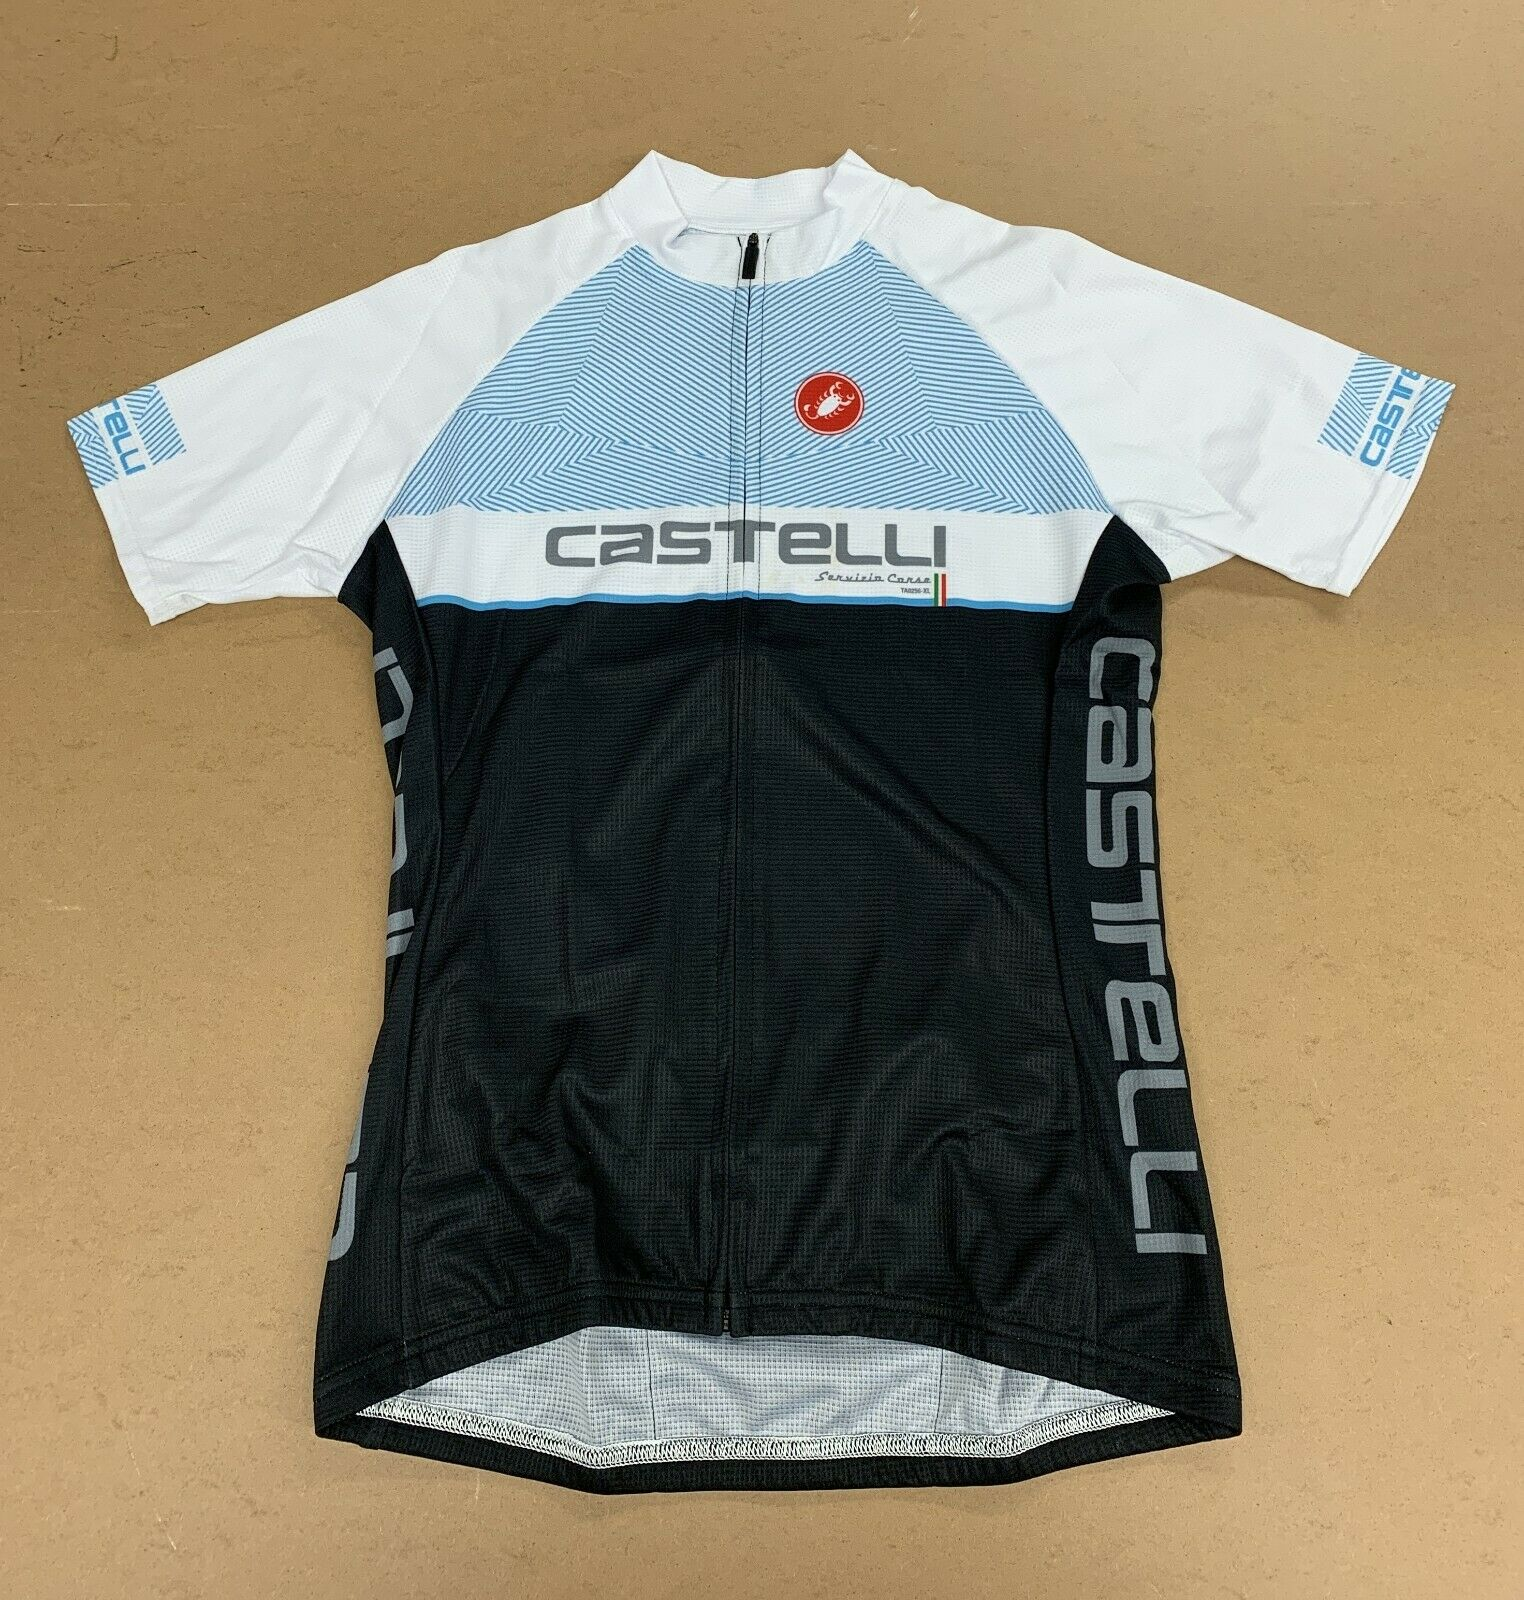 Castelli  Women's Team Jersey Size L  fitness retailer